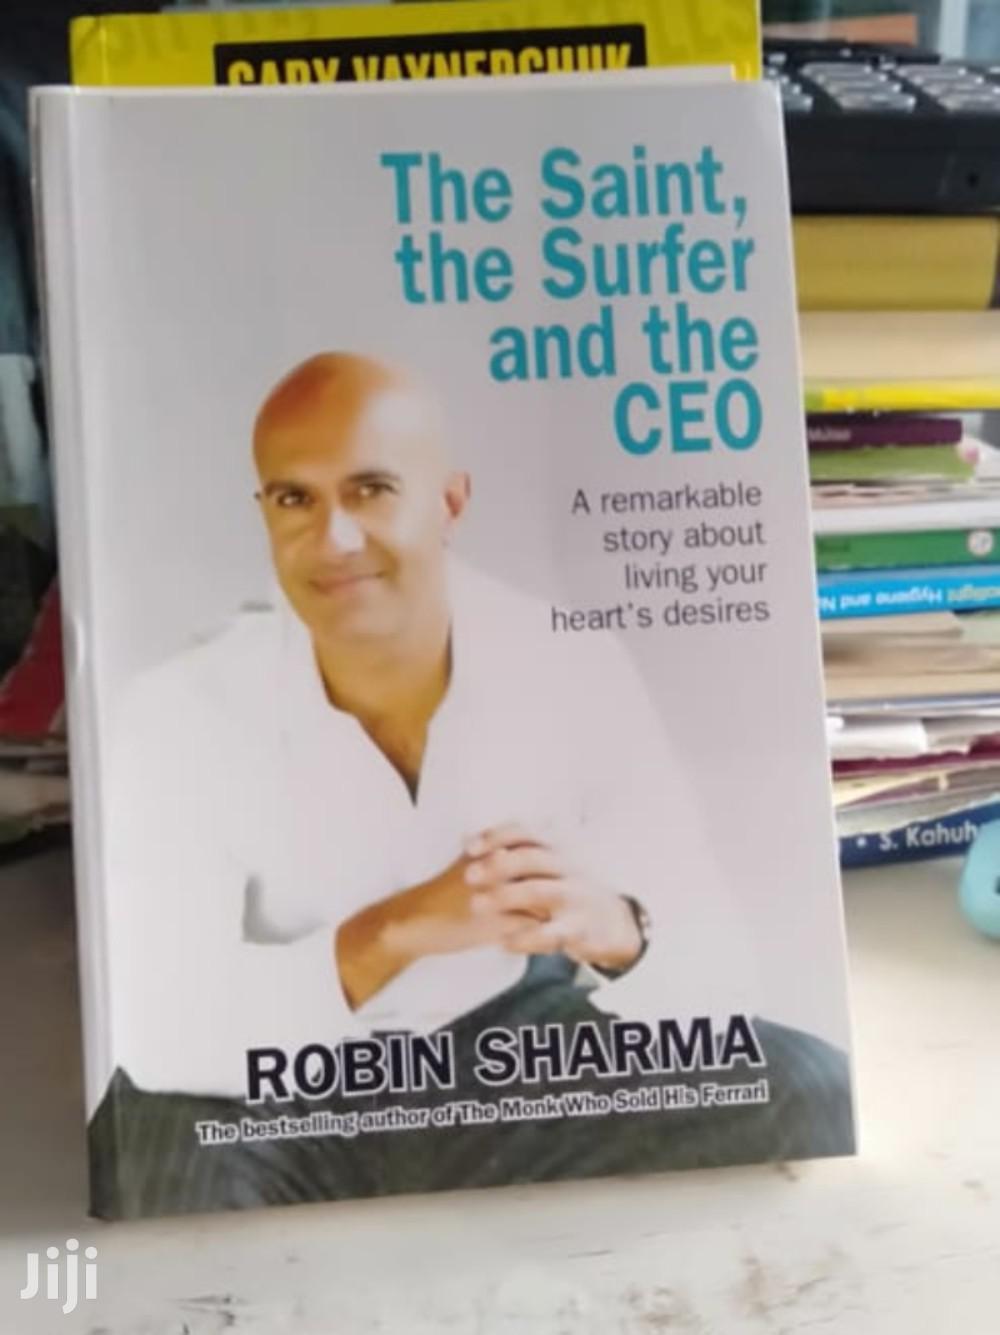 The Saint, the Surfer and the CEO - Robin Sharma